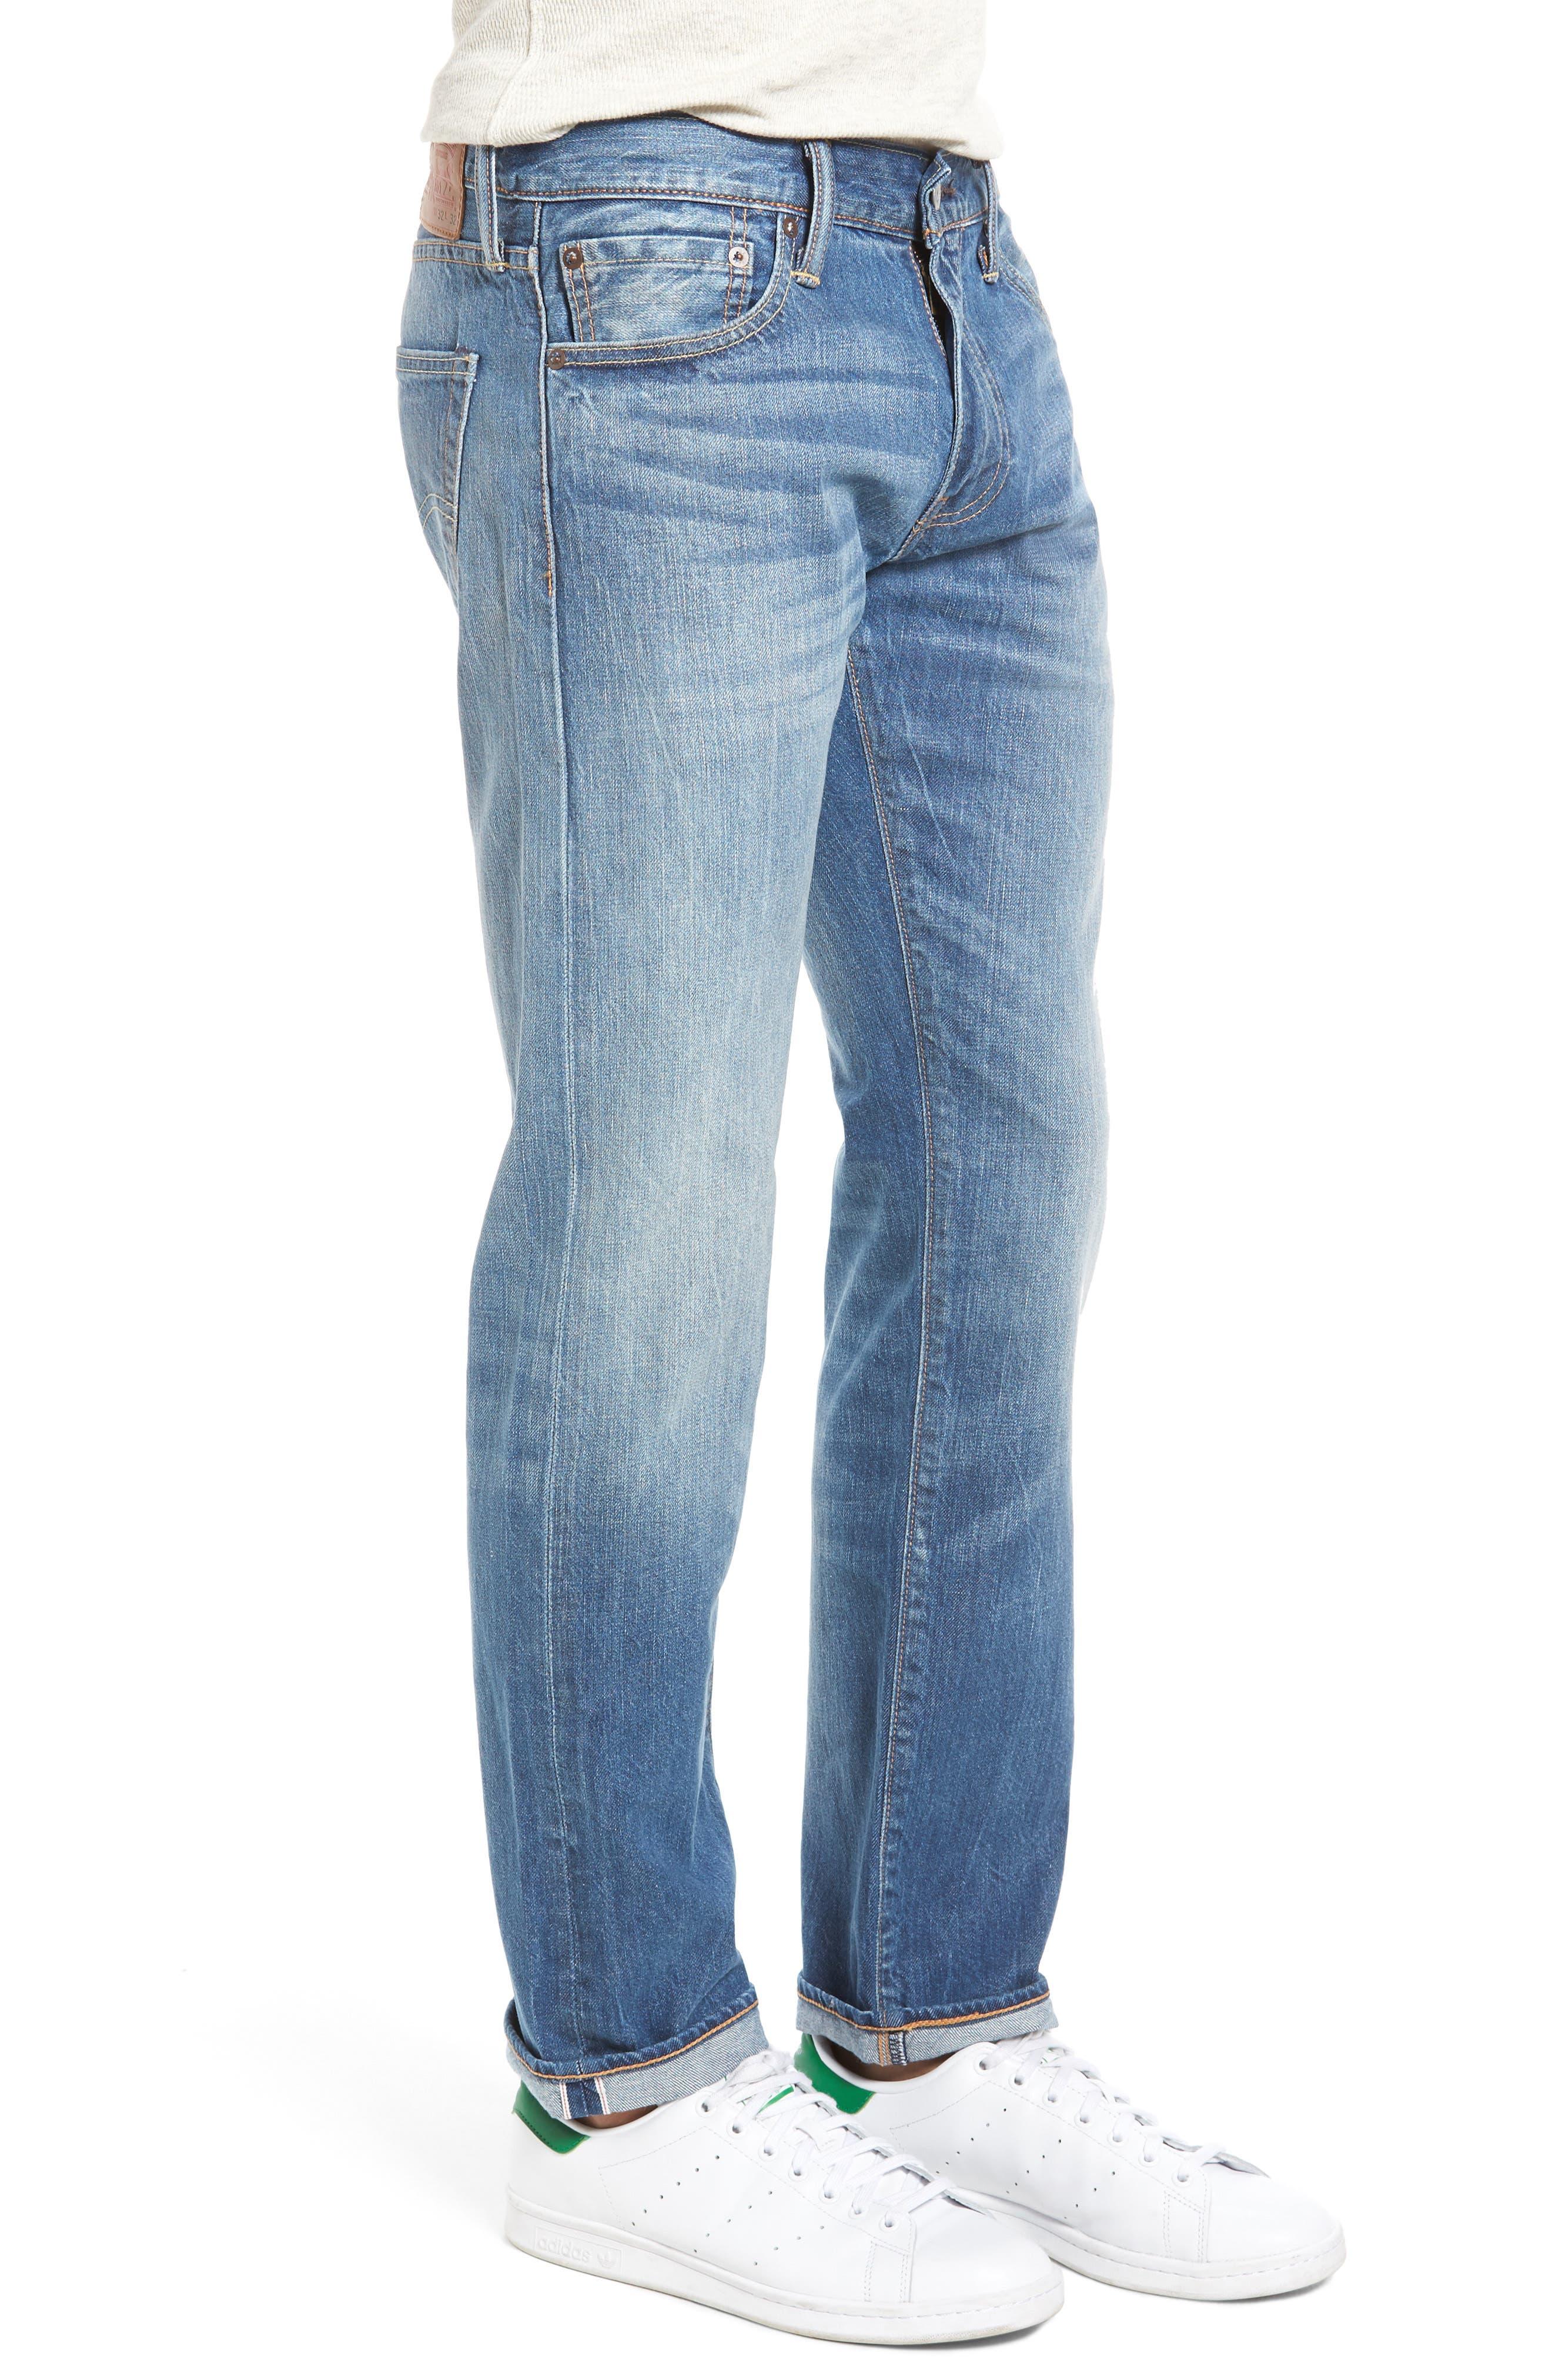 LEVI'S<SUP>®</SUP>,                             511<sup>™</sup> Slim Fit Jeans,                             Alternate thumbnail 3, color,                             425